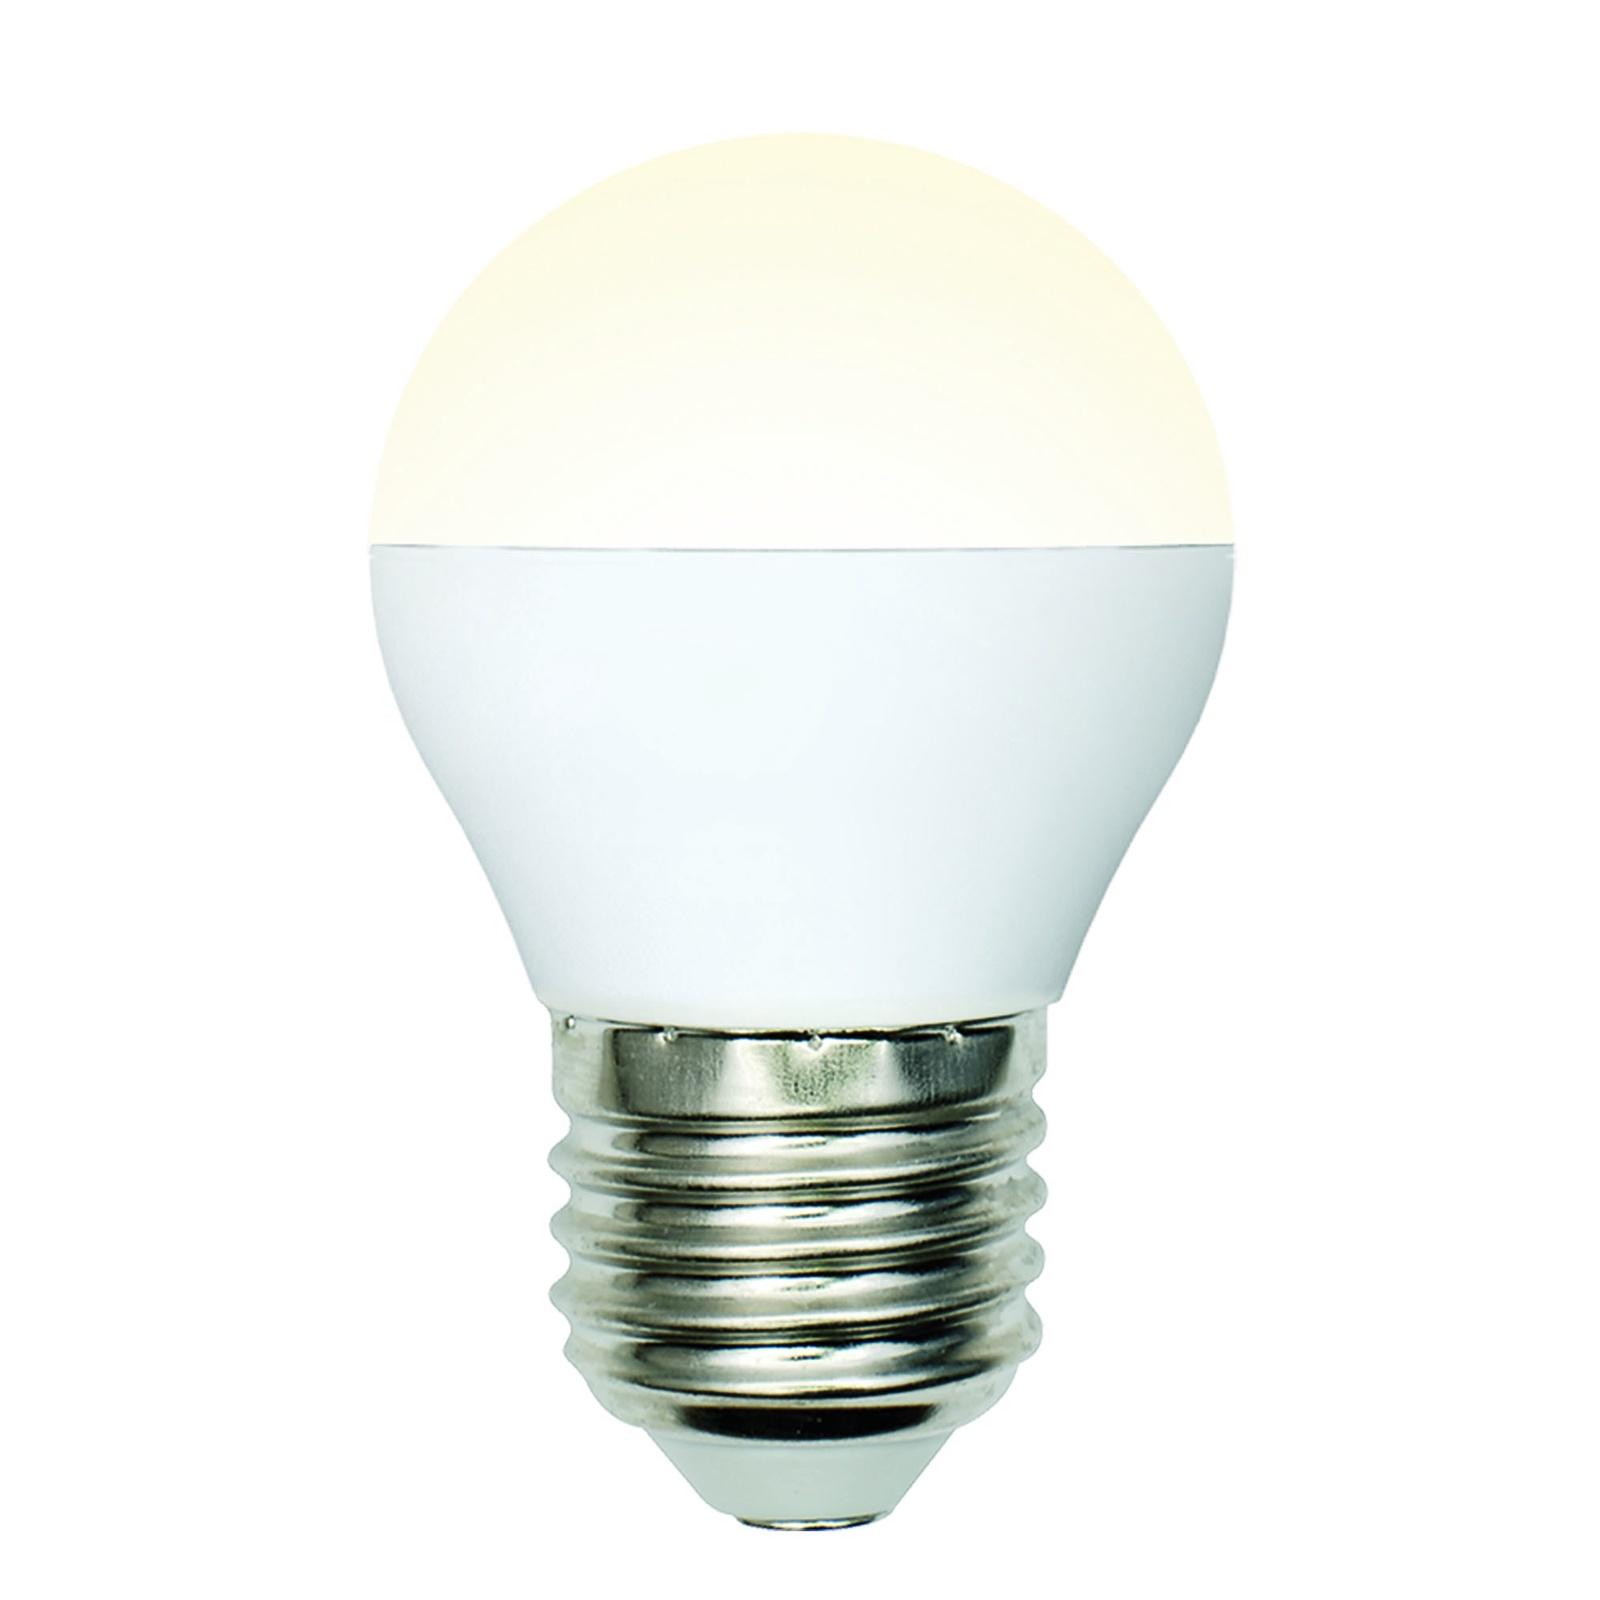 Лампочка Uniel LED-G45-6W/WW/E27/FR/MB 3000K, Теплый свет 6 Вт, Светодиодная